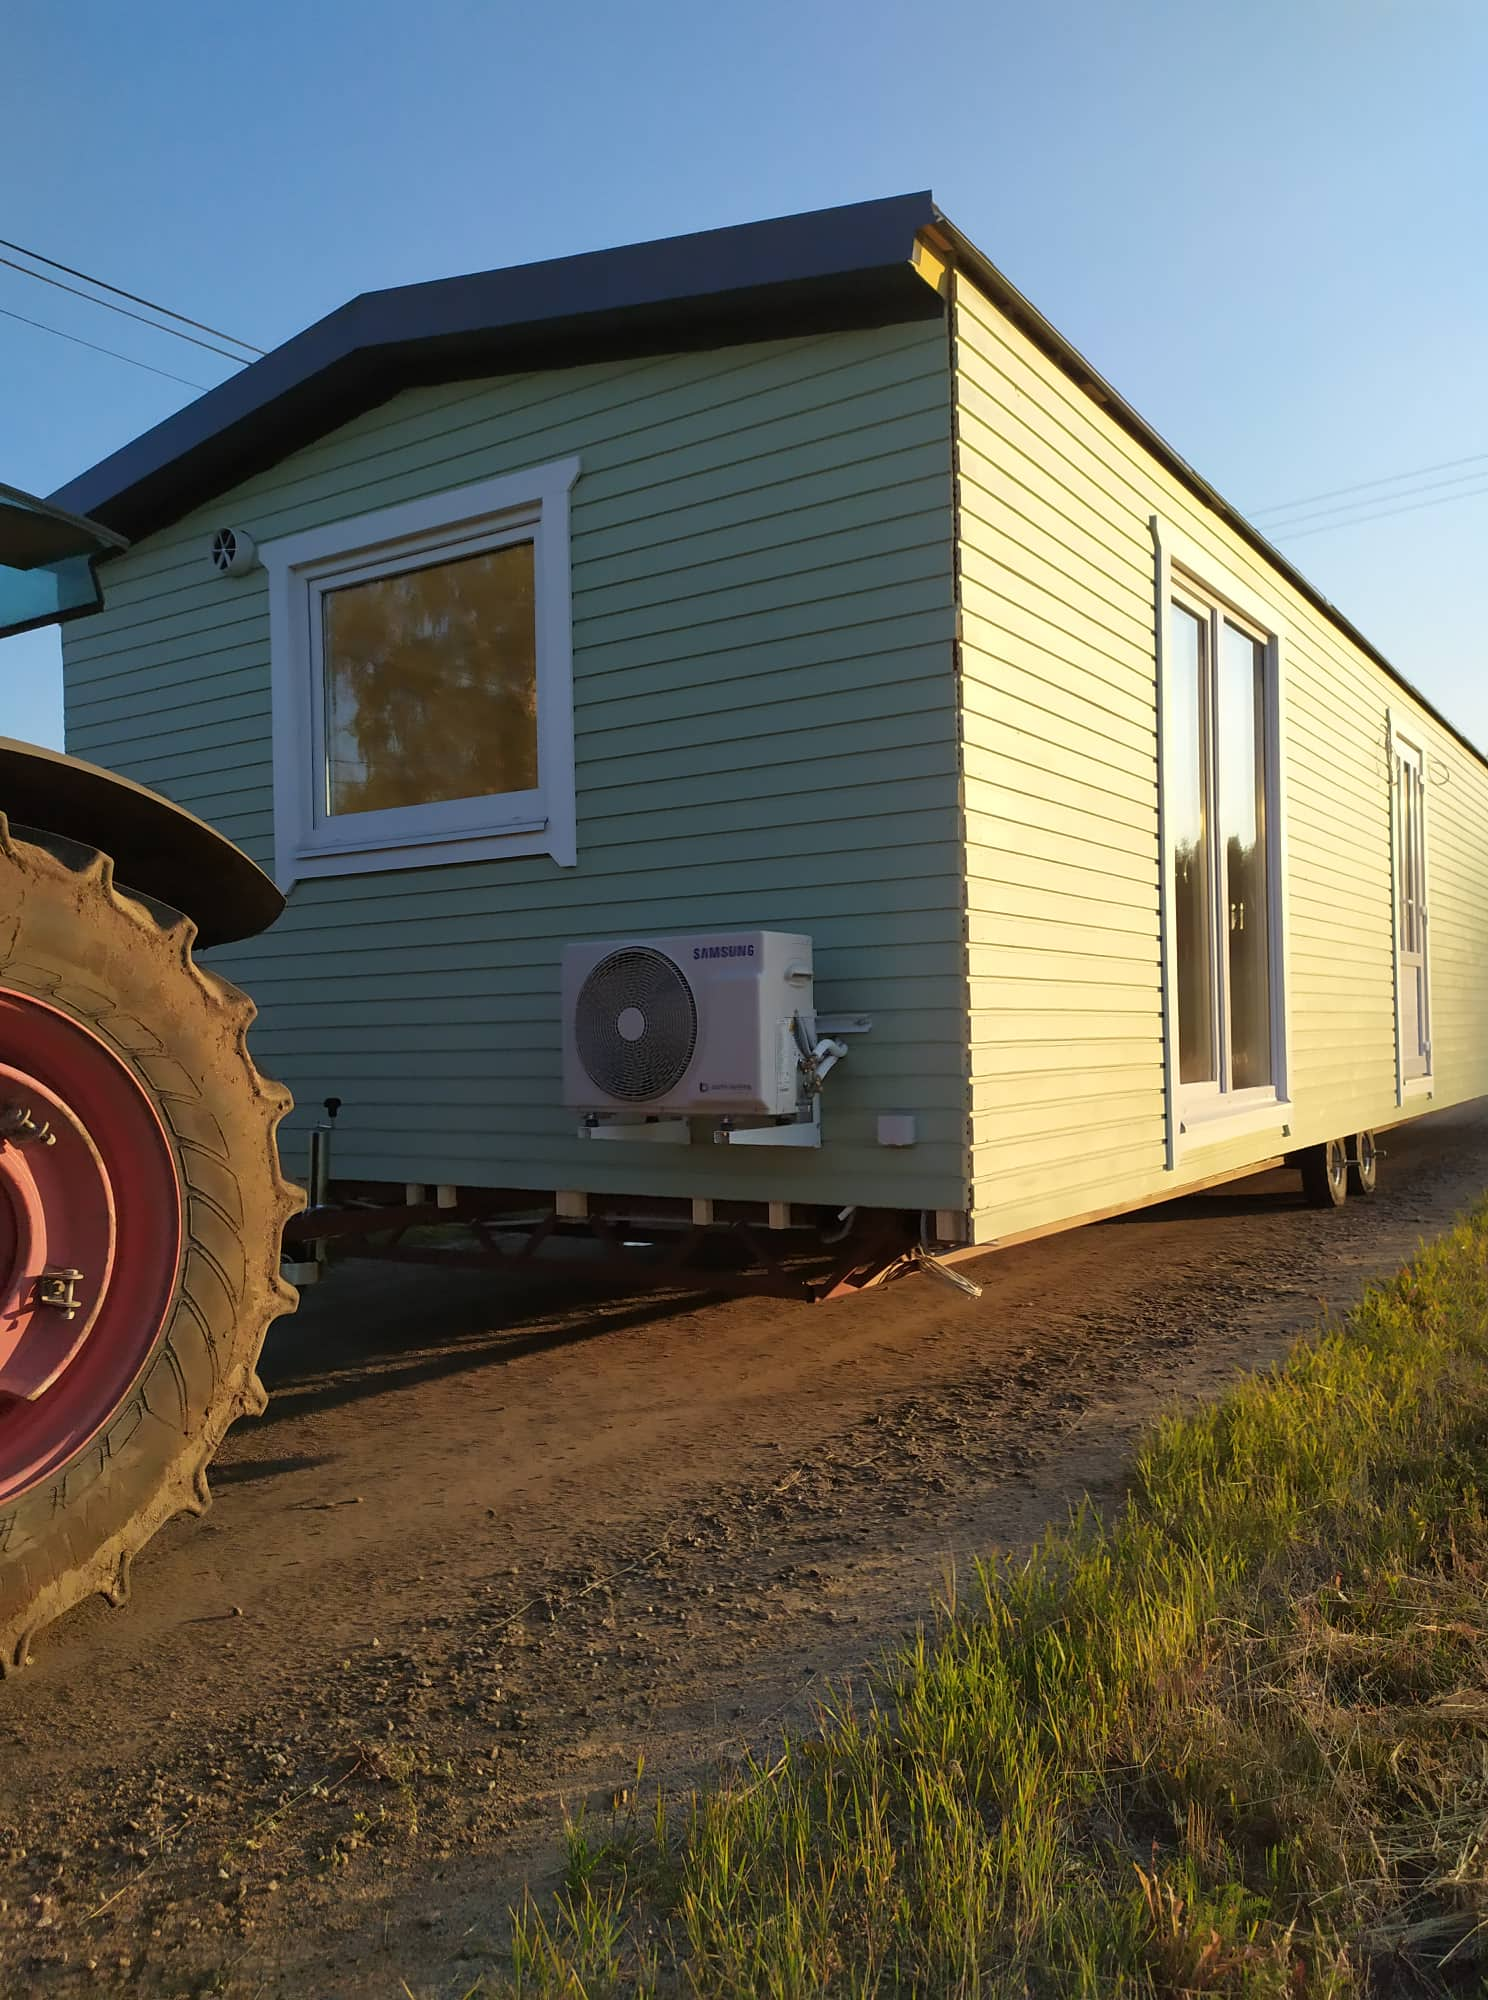 Talovaunu traktorilla suomessa